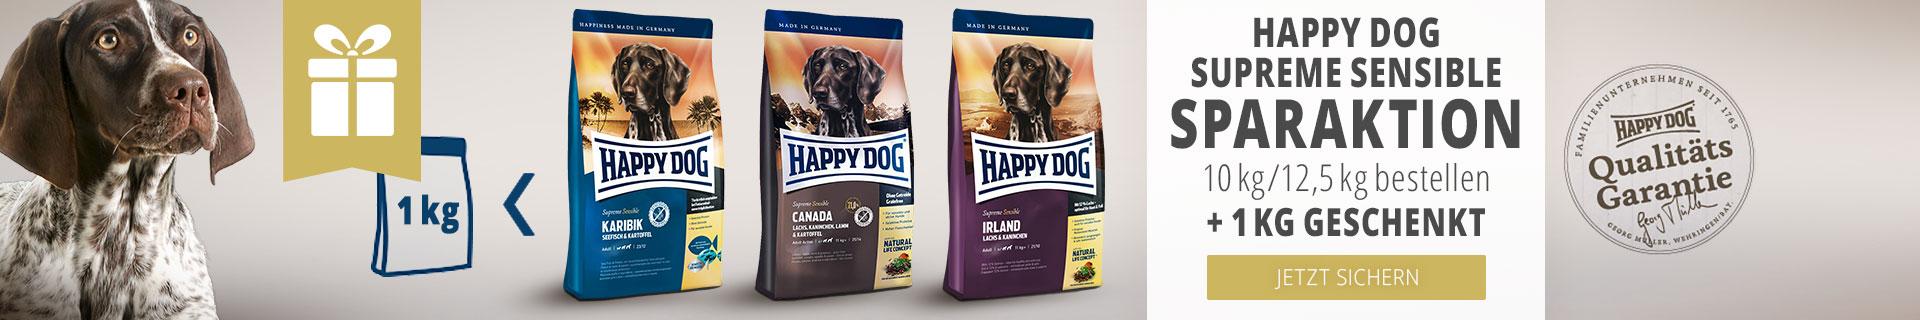 Happy Dog Supreme Sensible Sparaktion 10kg/12,5kg bestellen + 1kg geschenkt